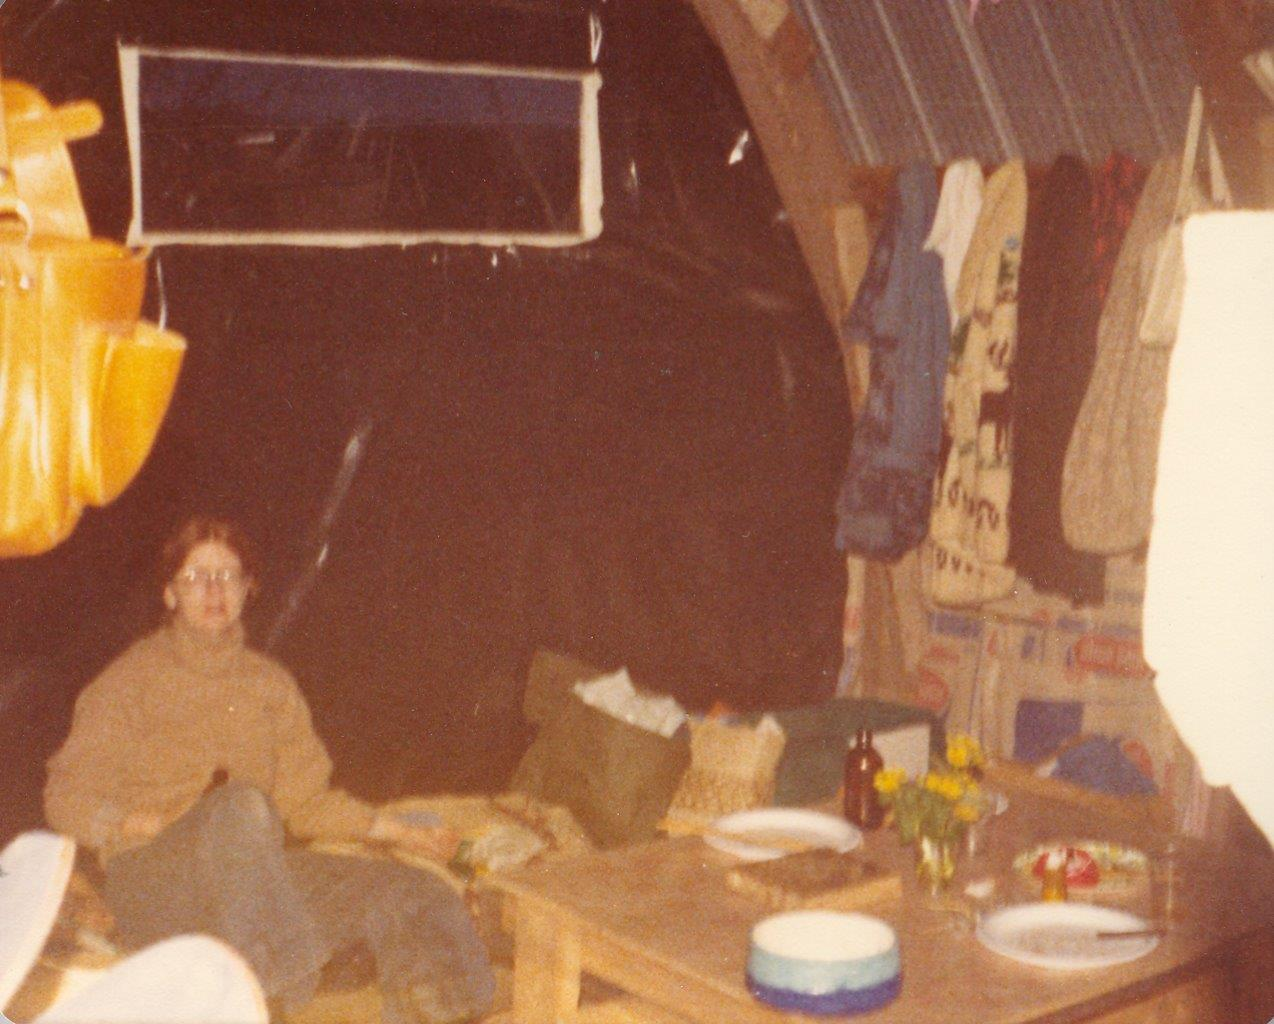 198005xx-ra-005-Barb In Barn-Randboro